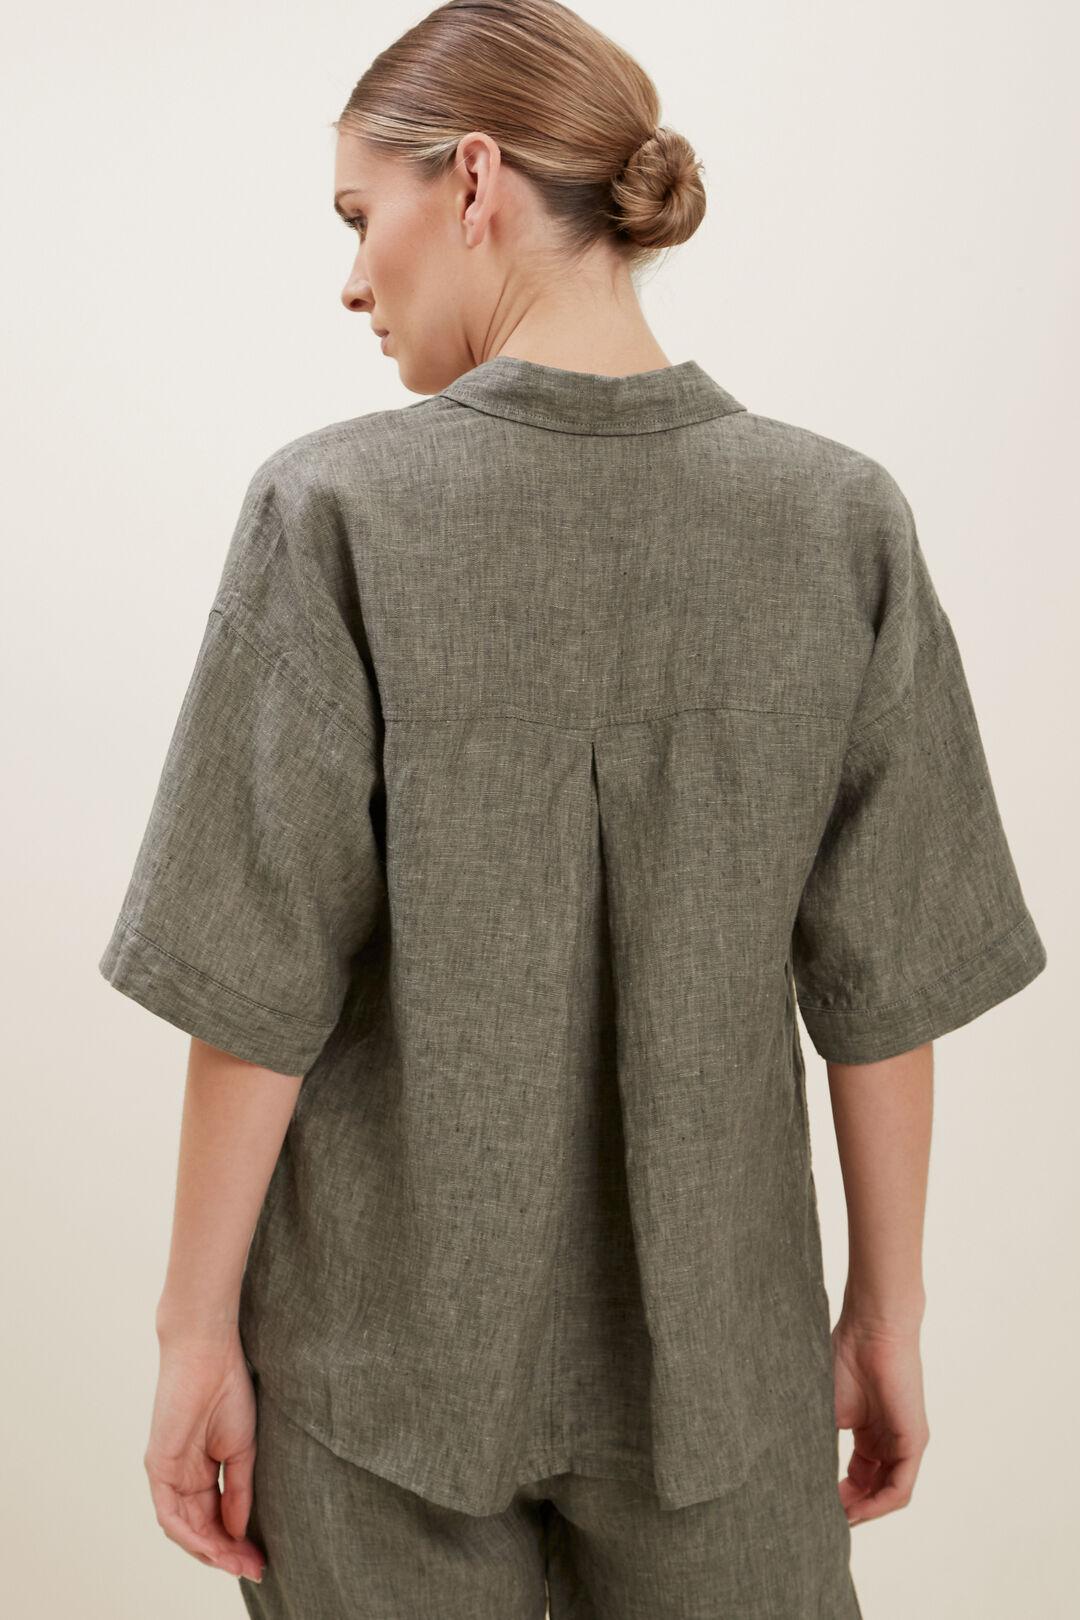 Short Sleeve Linen Shirt  OLIVE KHAKI  hi-res